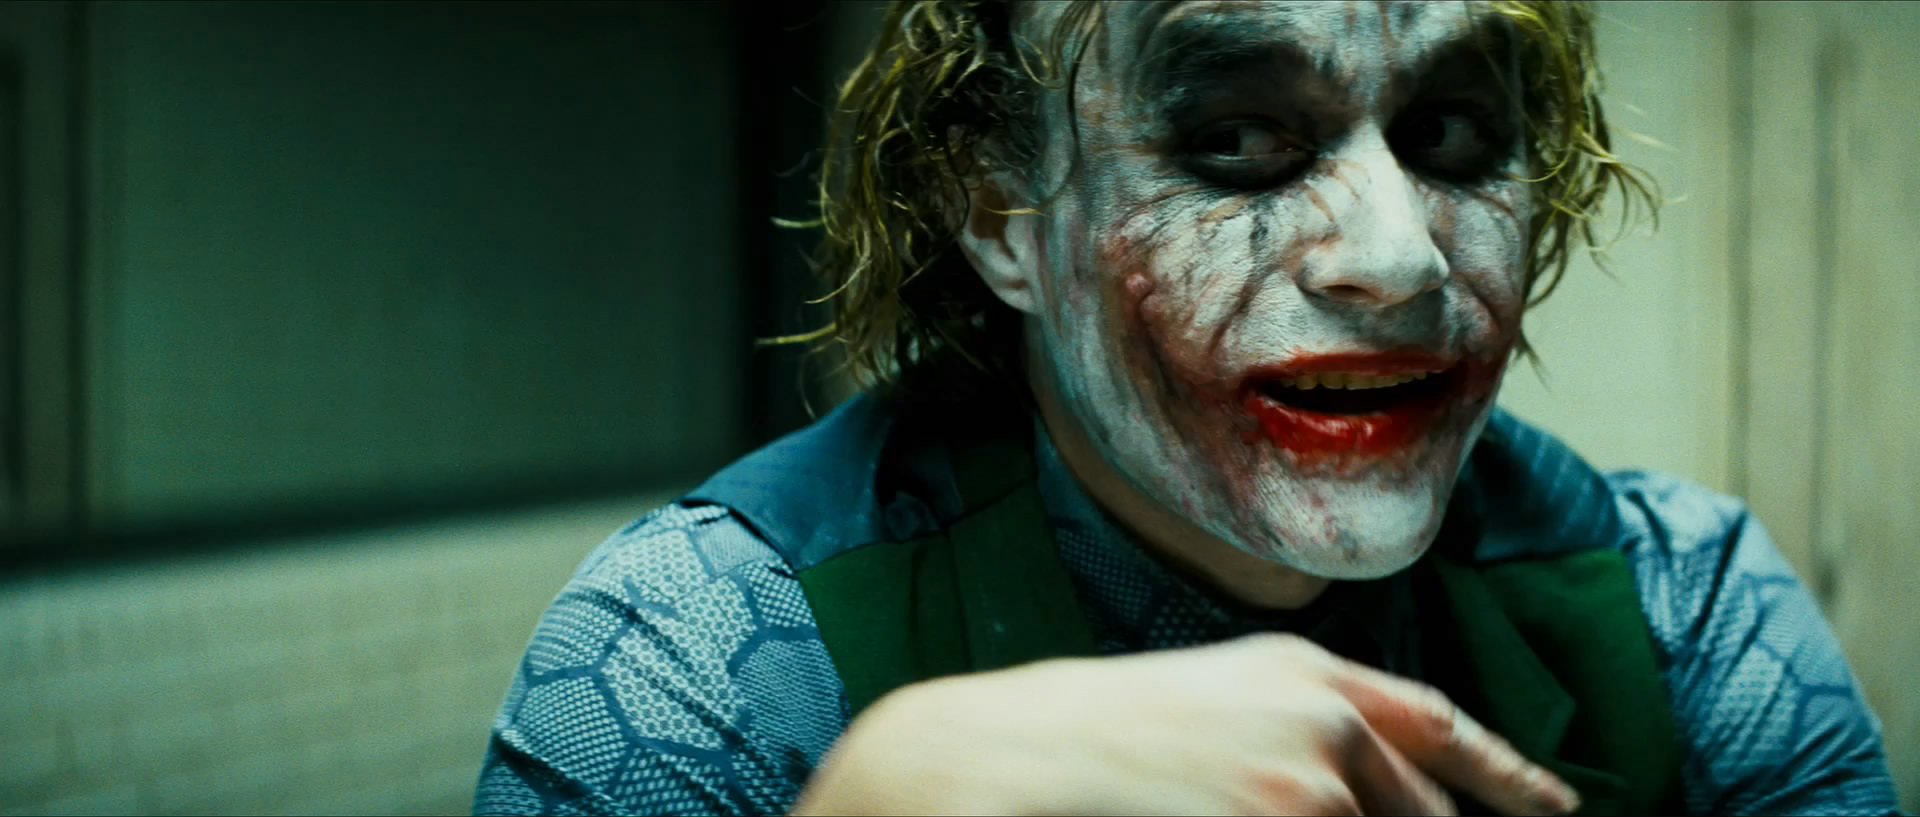 'The Dark Knight Trilogy' Villains: A Guide (Part 2